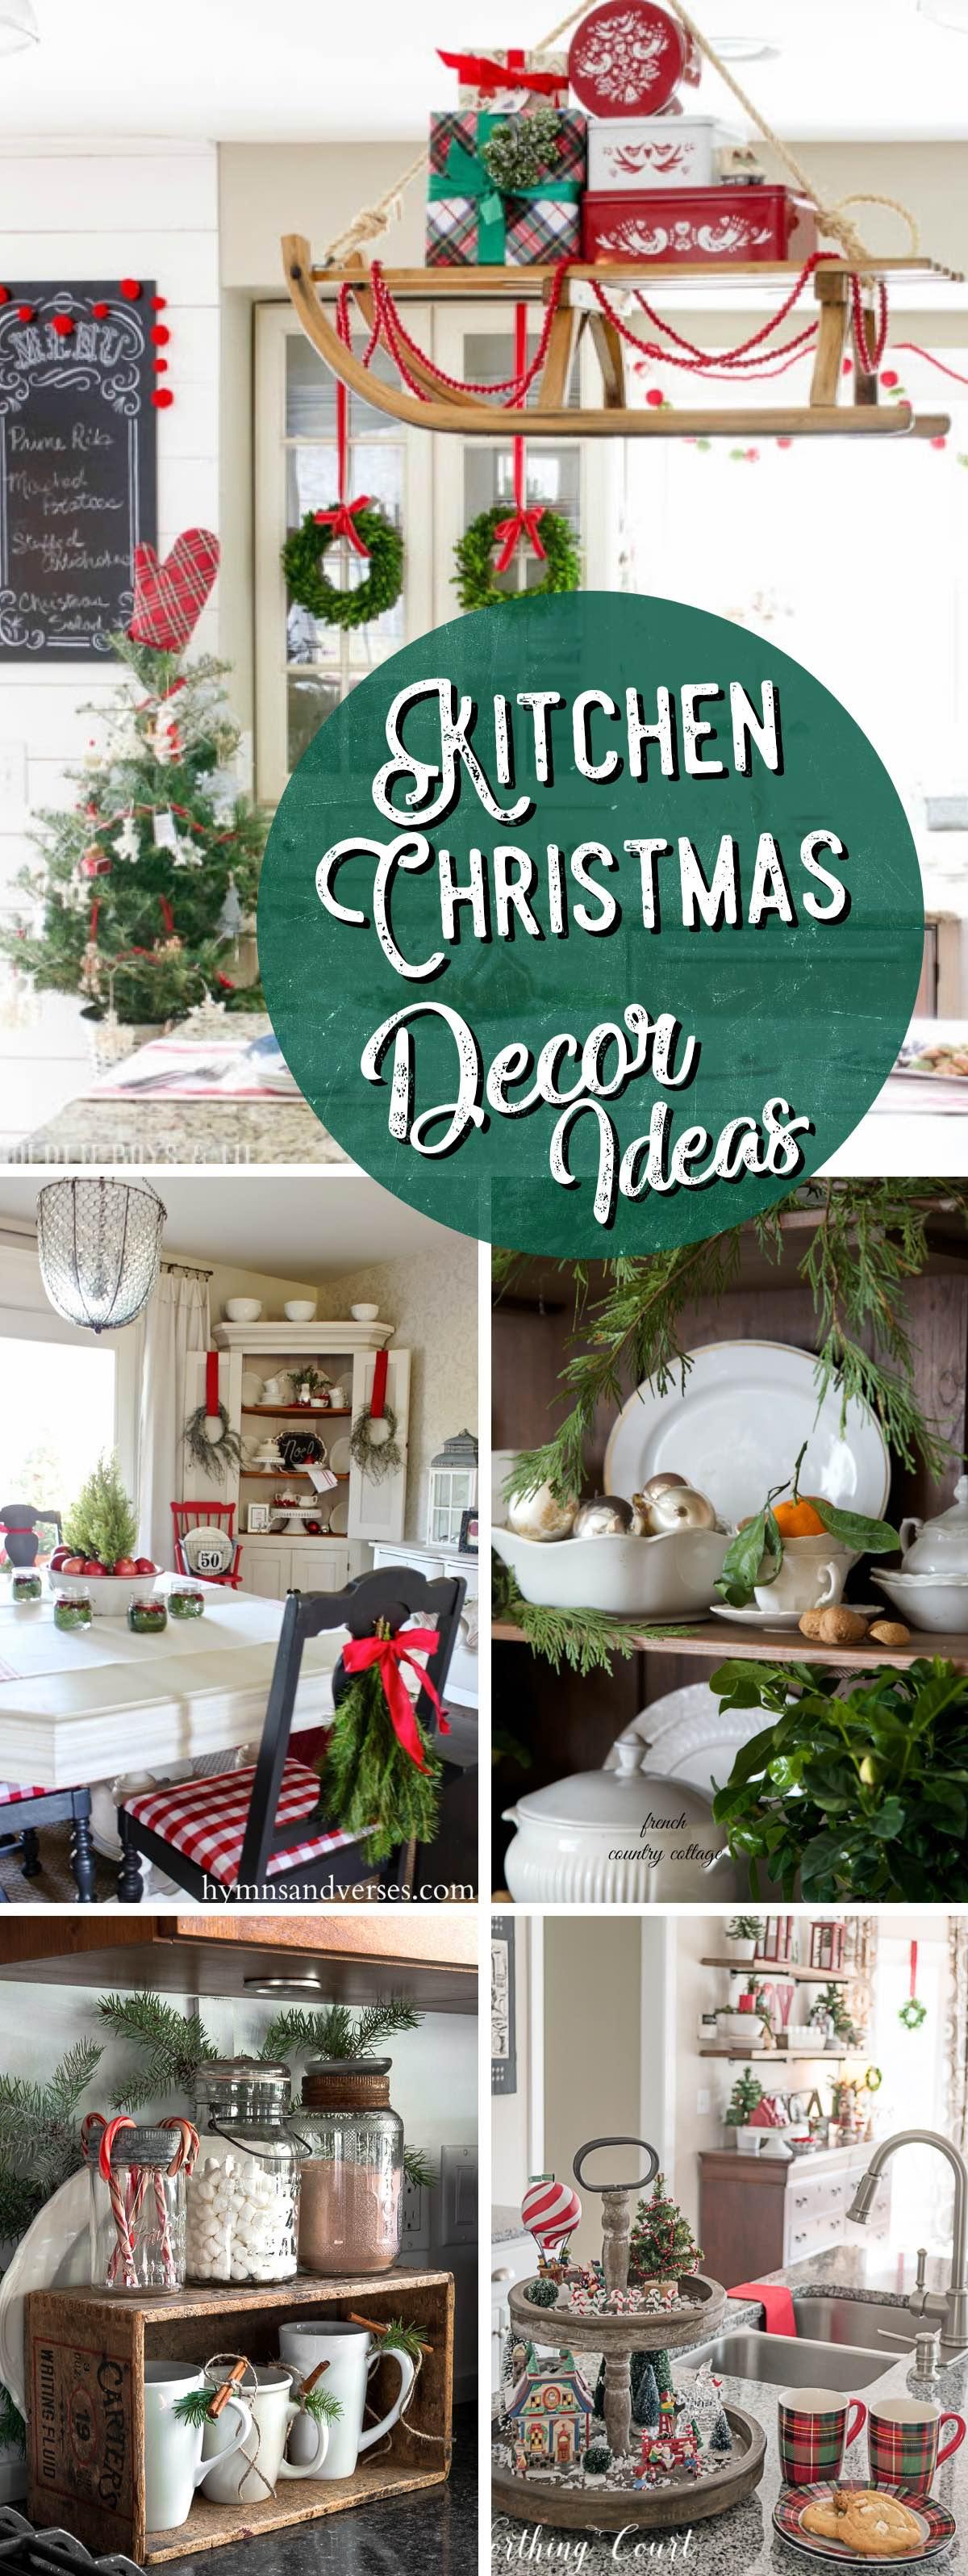 best Kitchen Christmas Decor Ideas